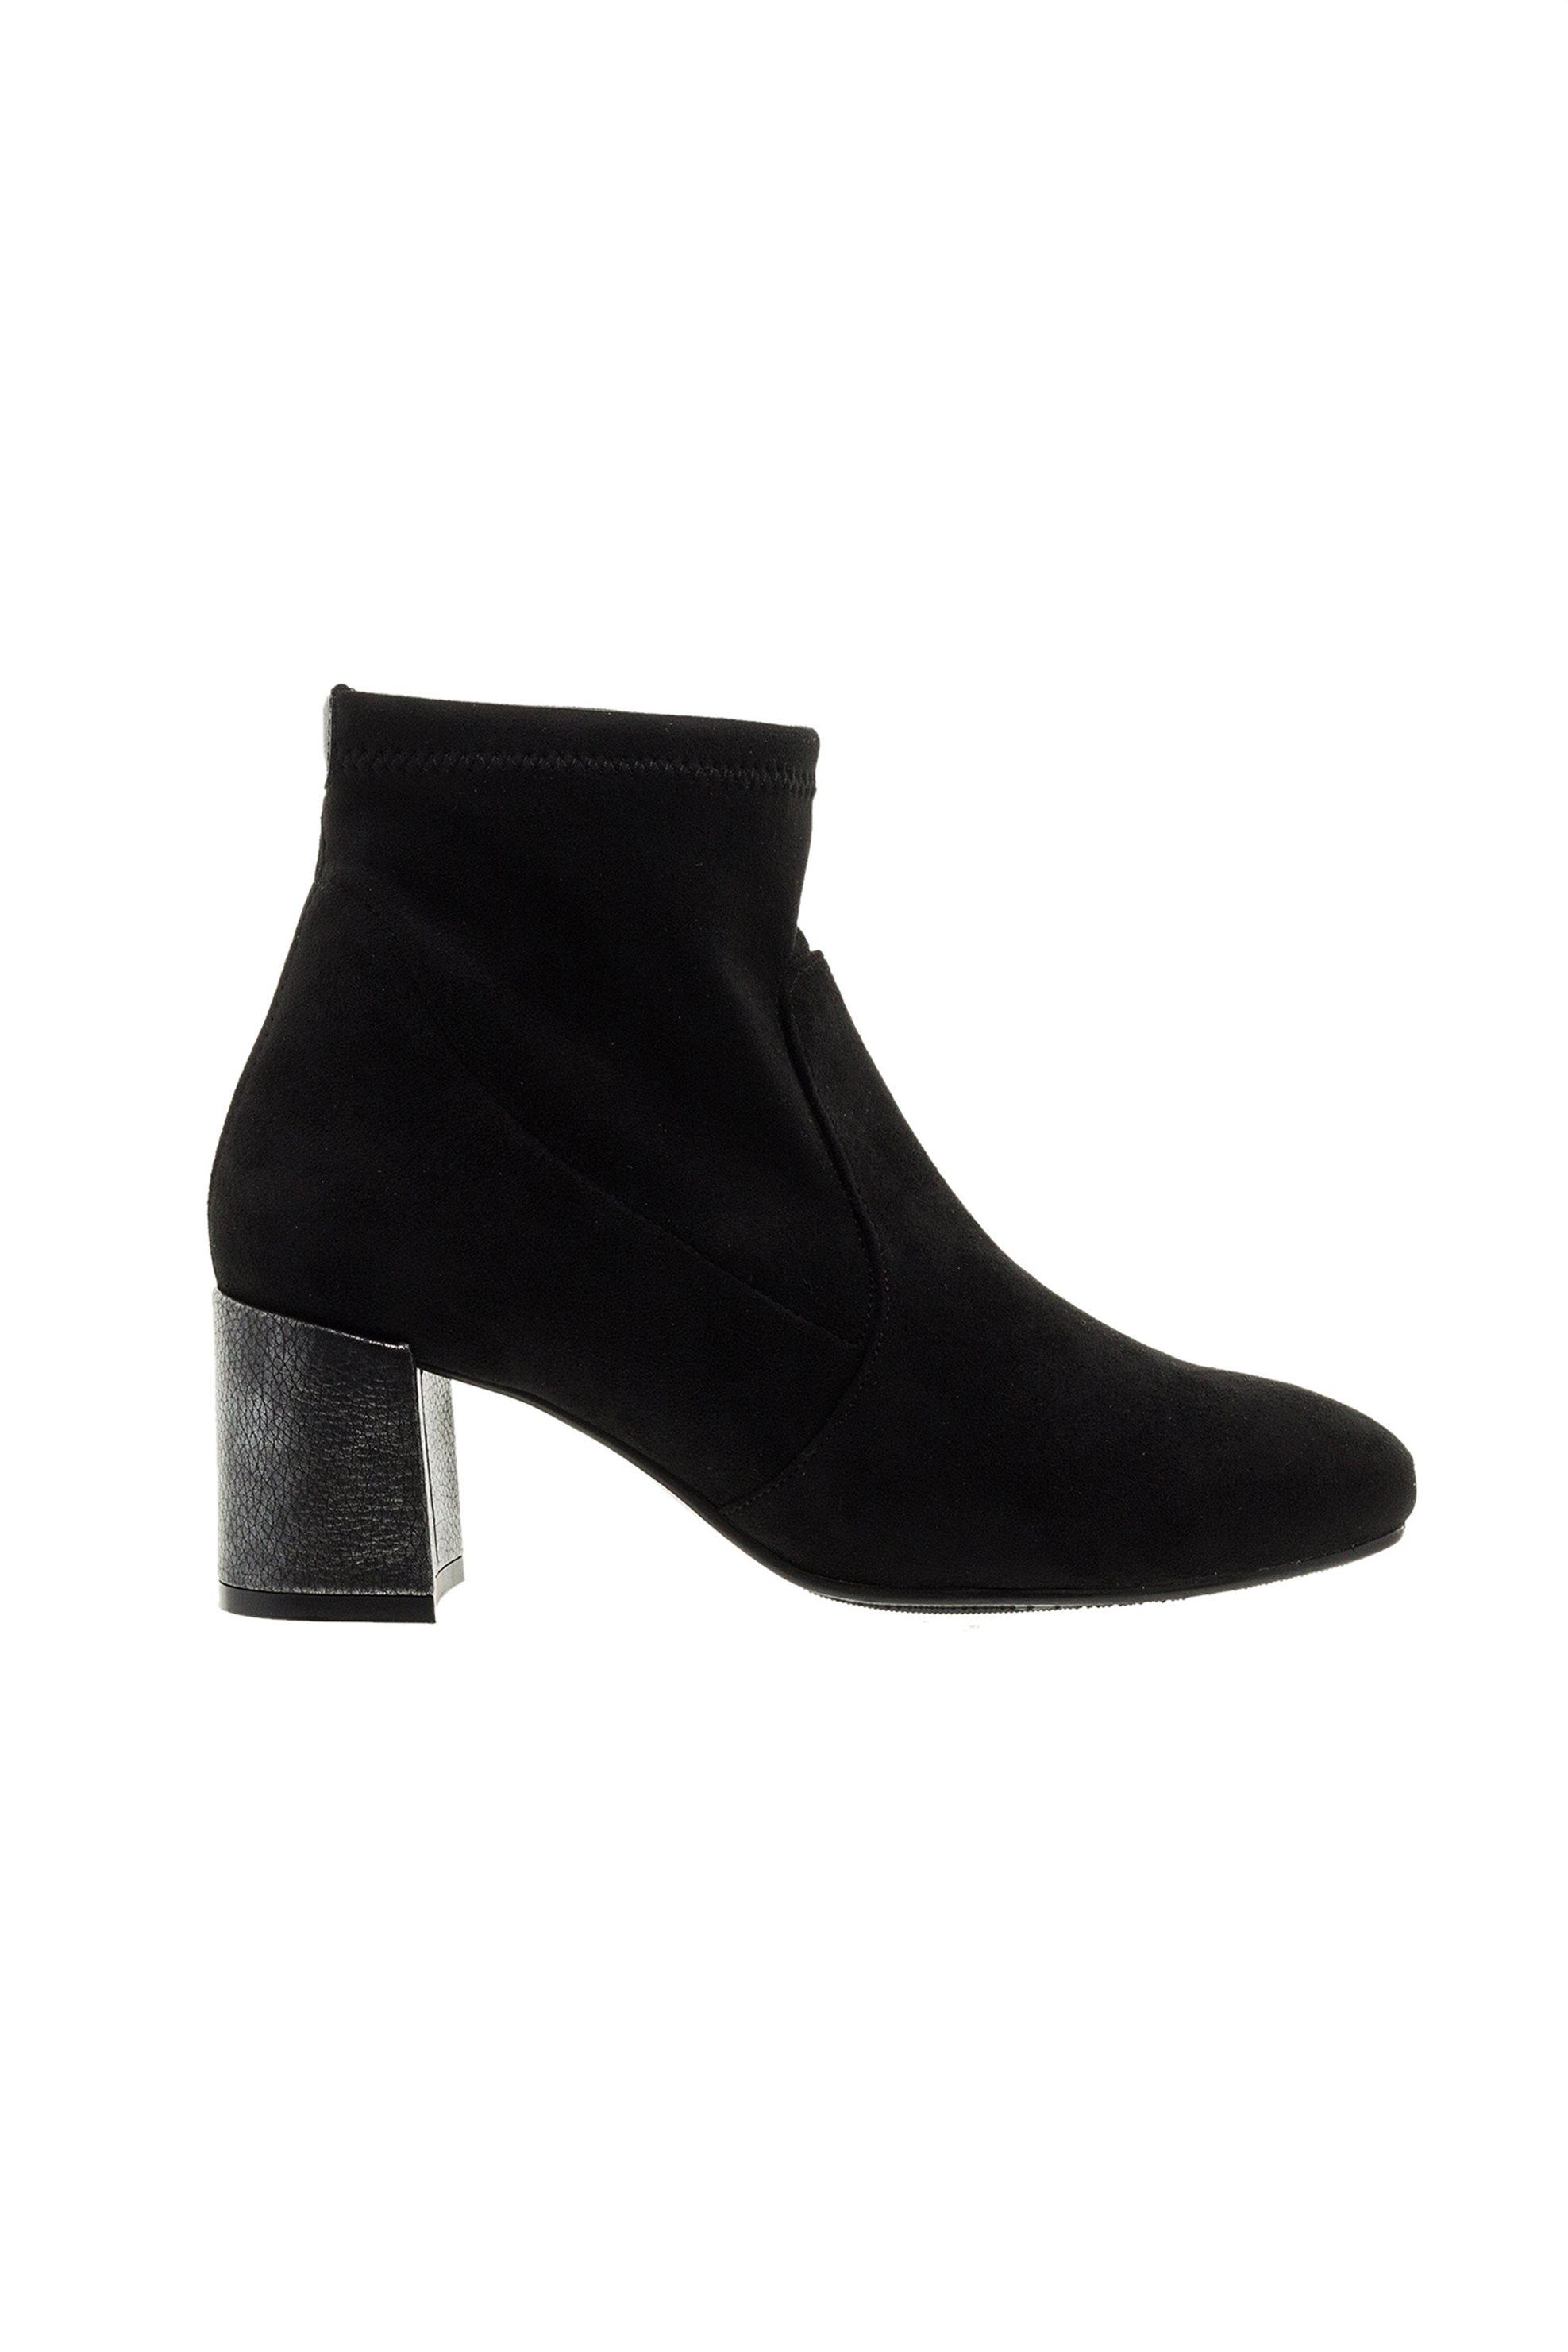 AVVENTO SHOES - Γυναικείες Μπότες-Μποτάκια  3432494ccb7